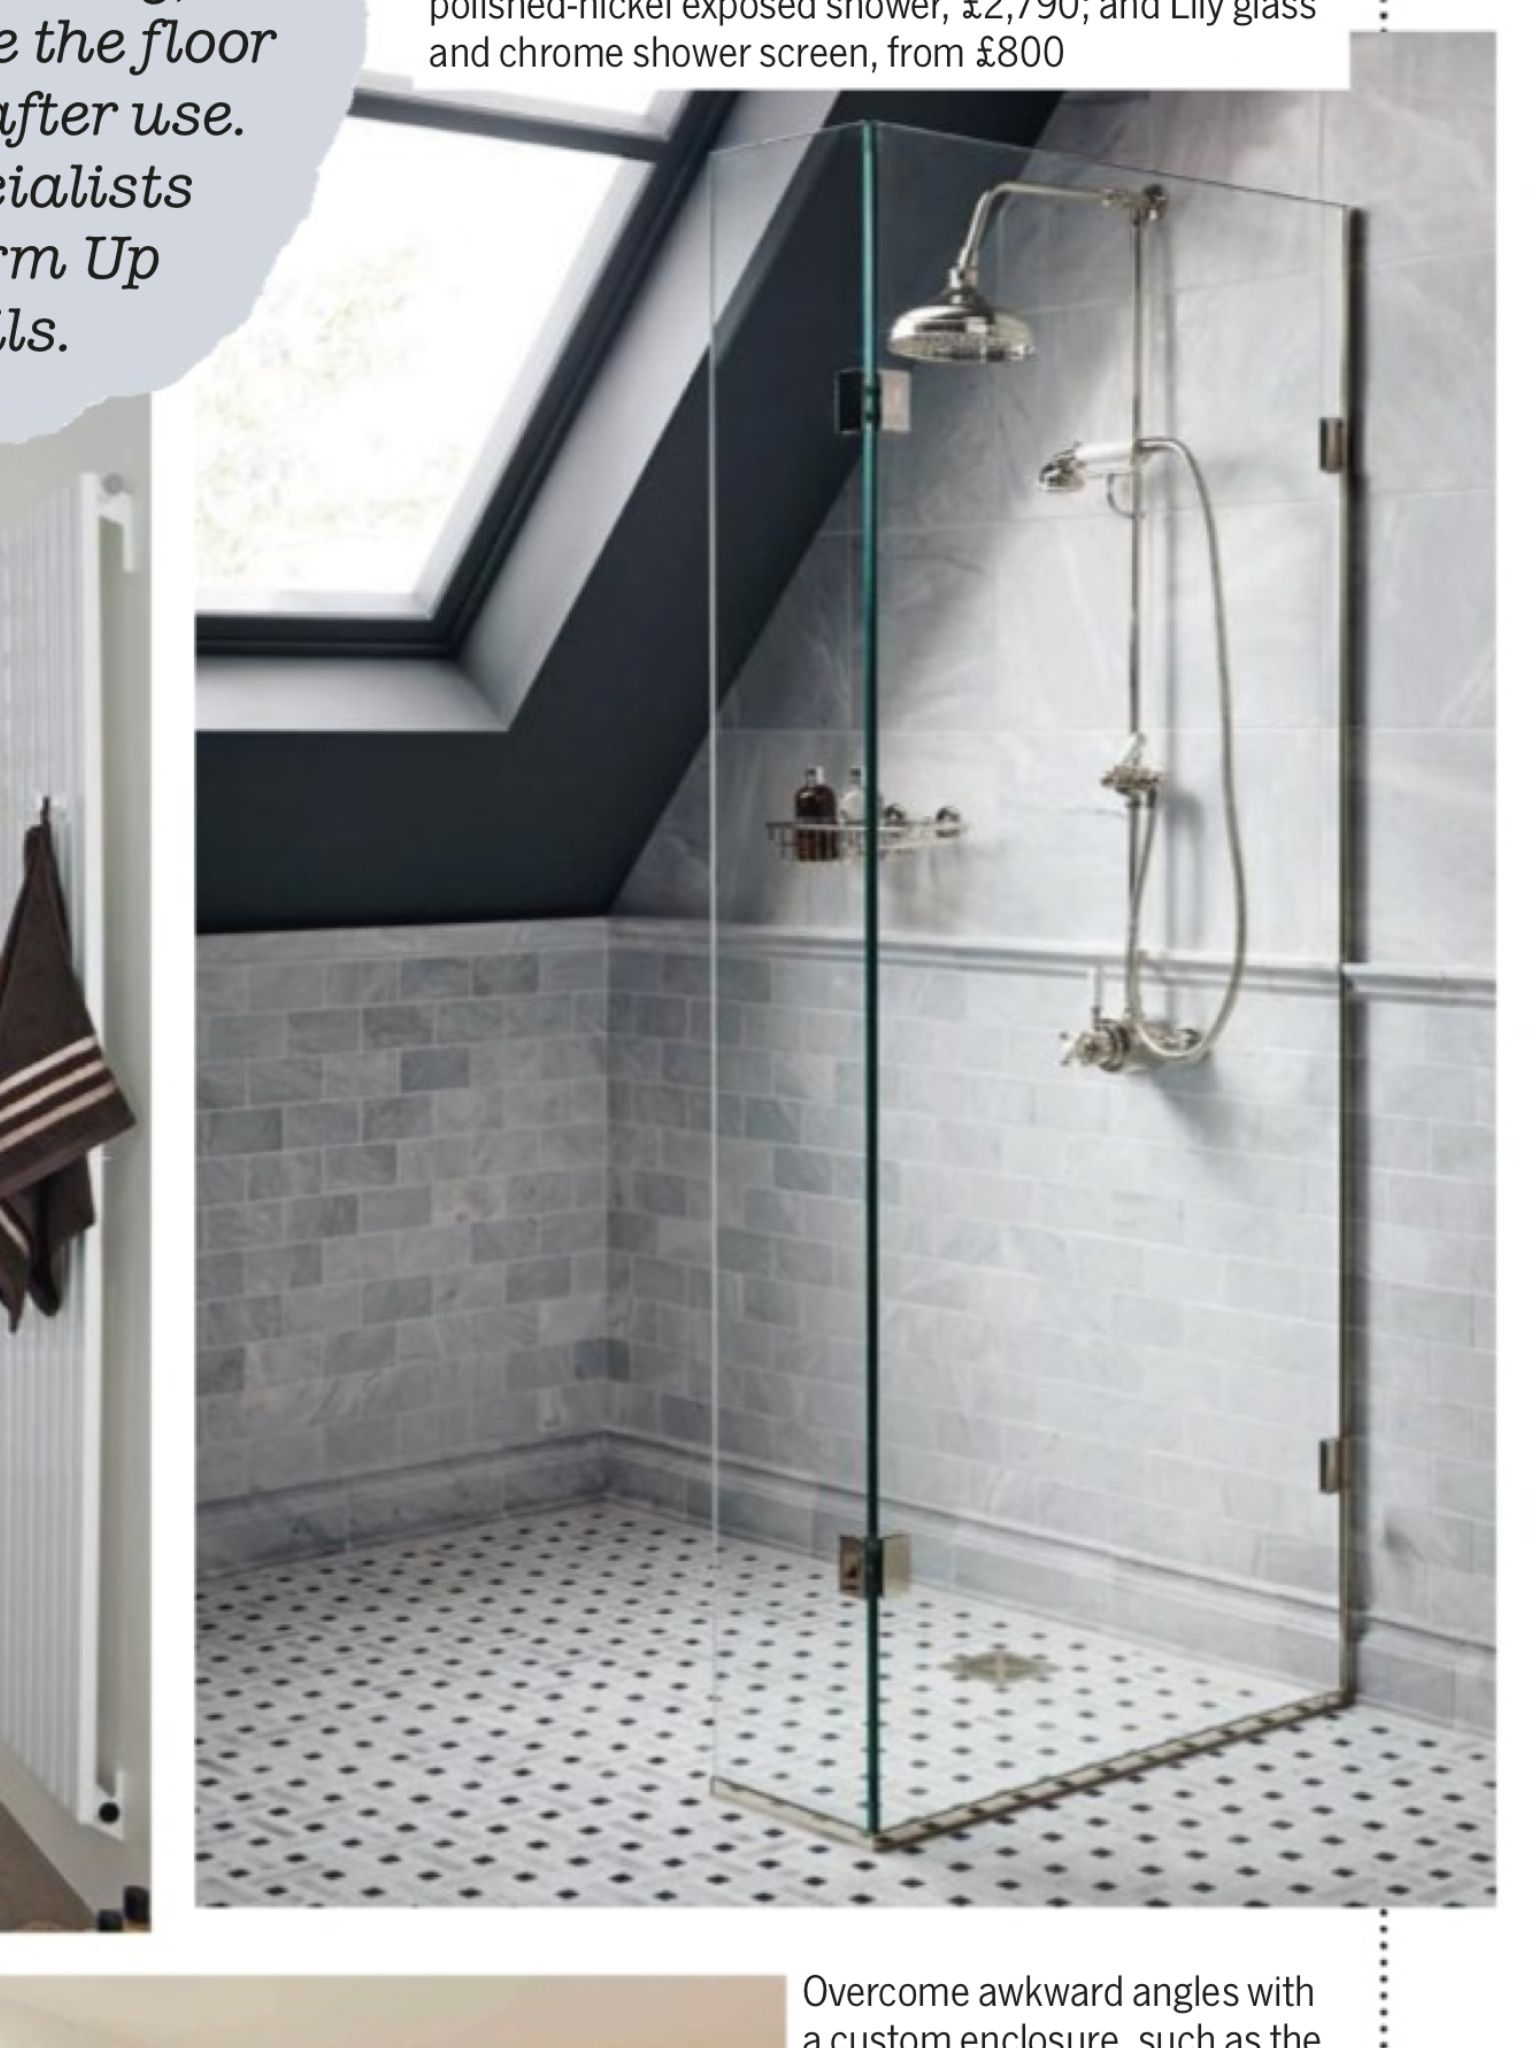 Attic shower option